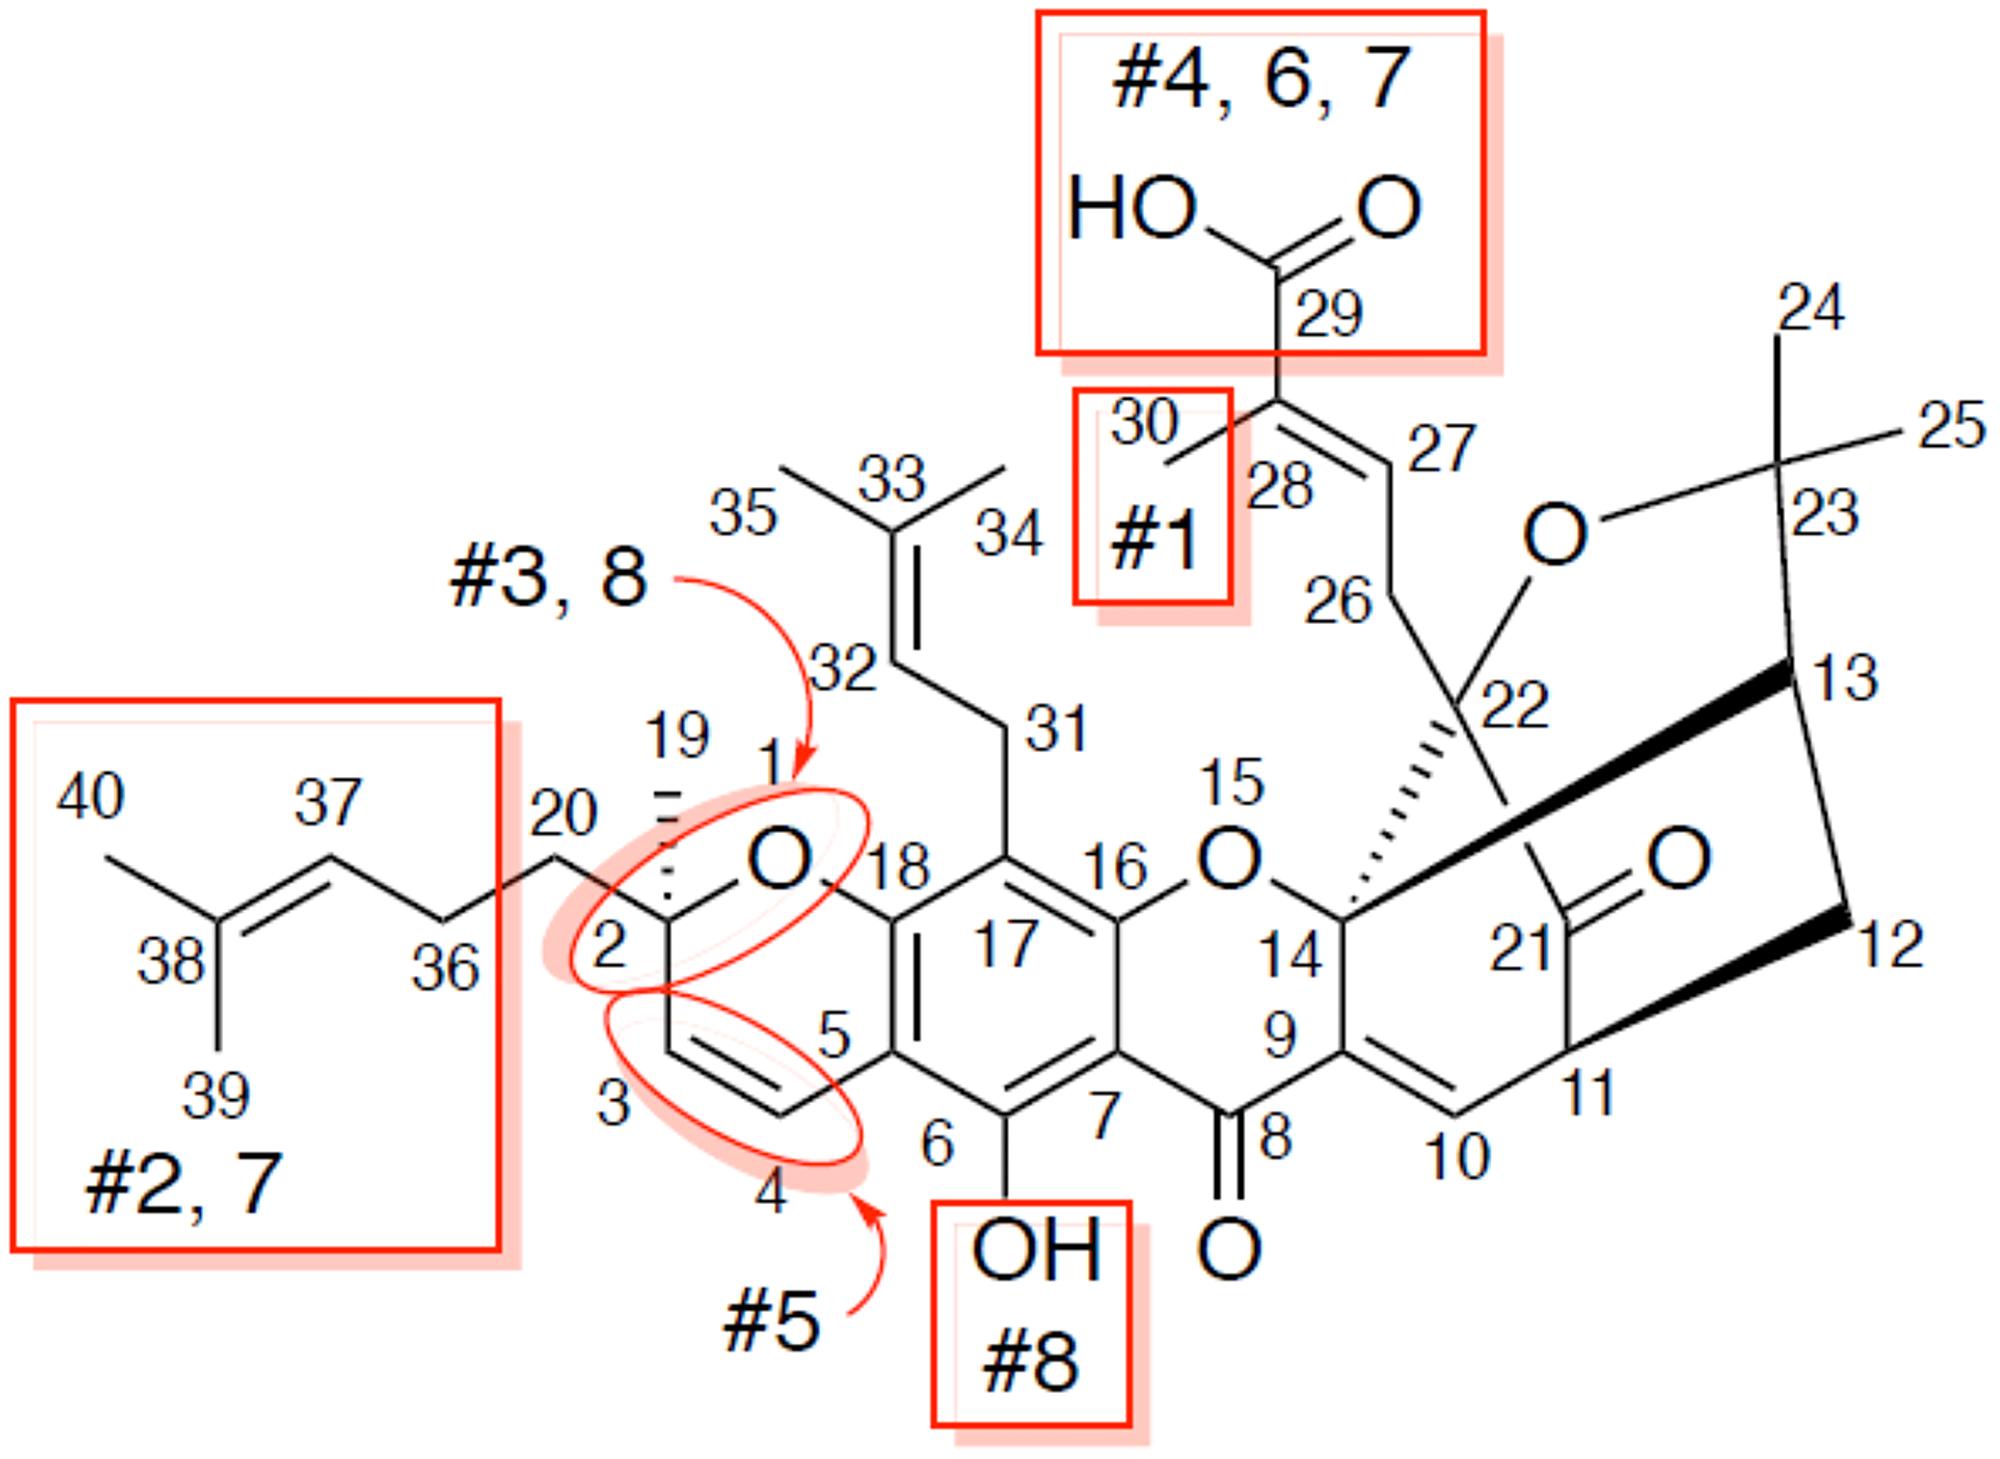 Analogs of gambogic acid (structure-activity relationship study).